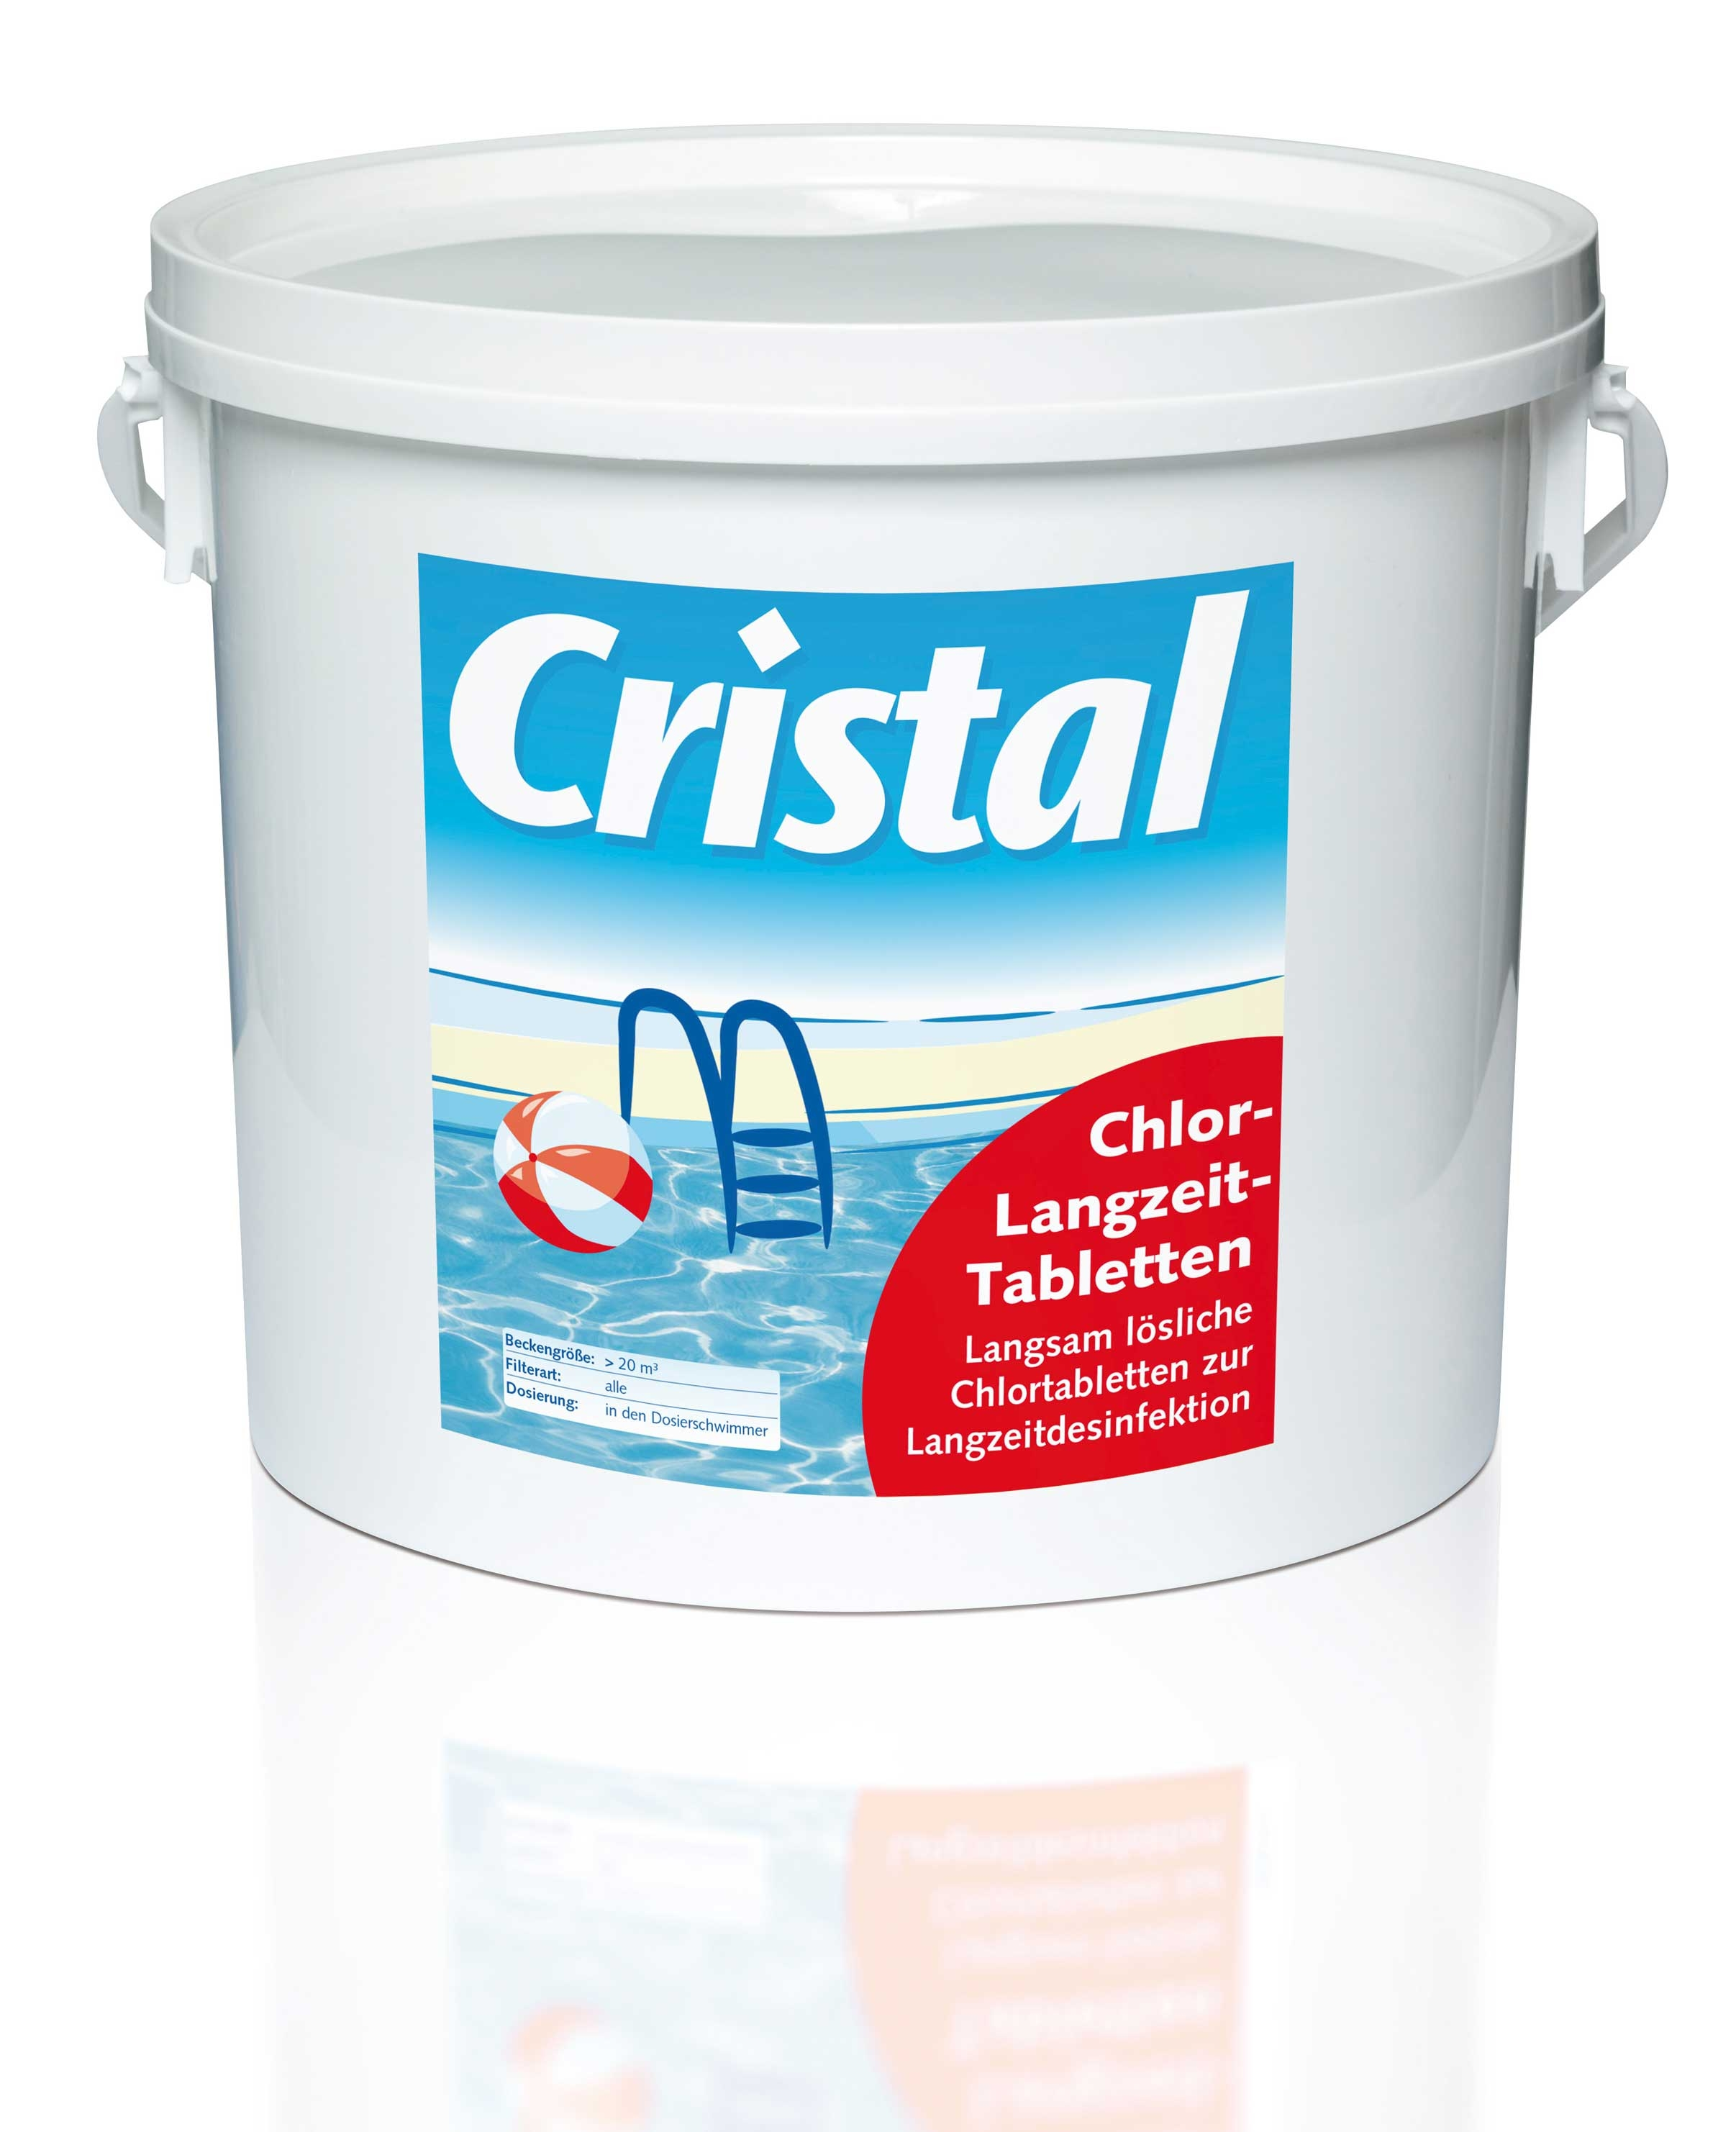 Cristal Chlor Langzeittabletten 5 kg